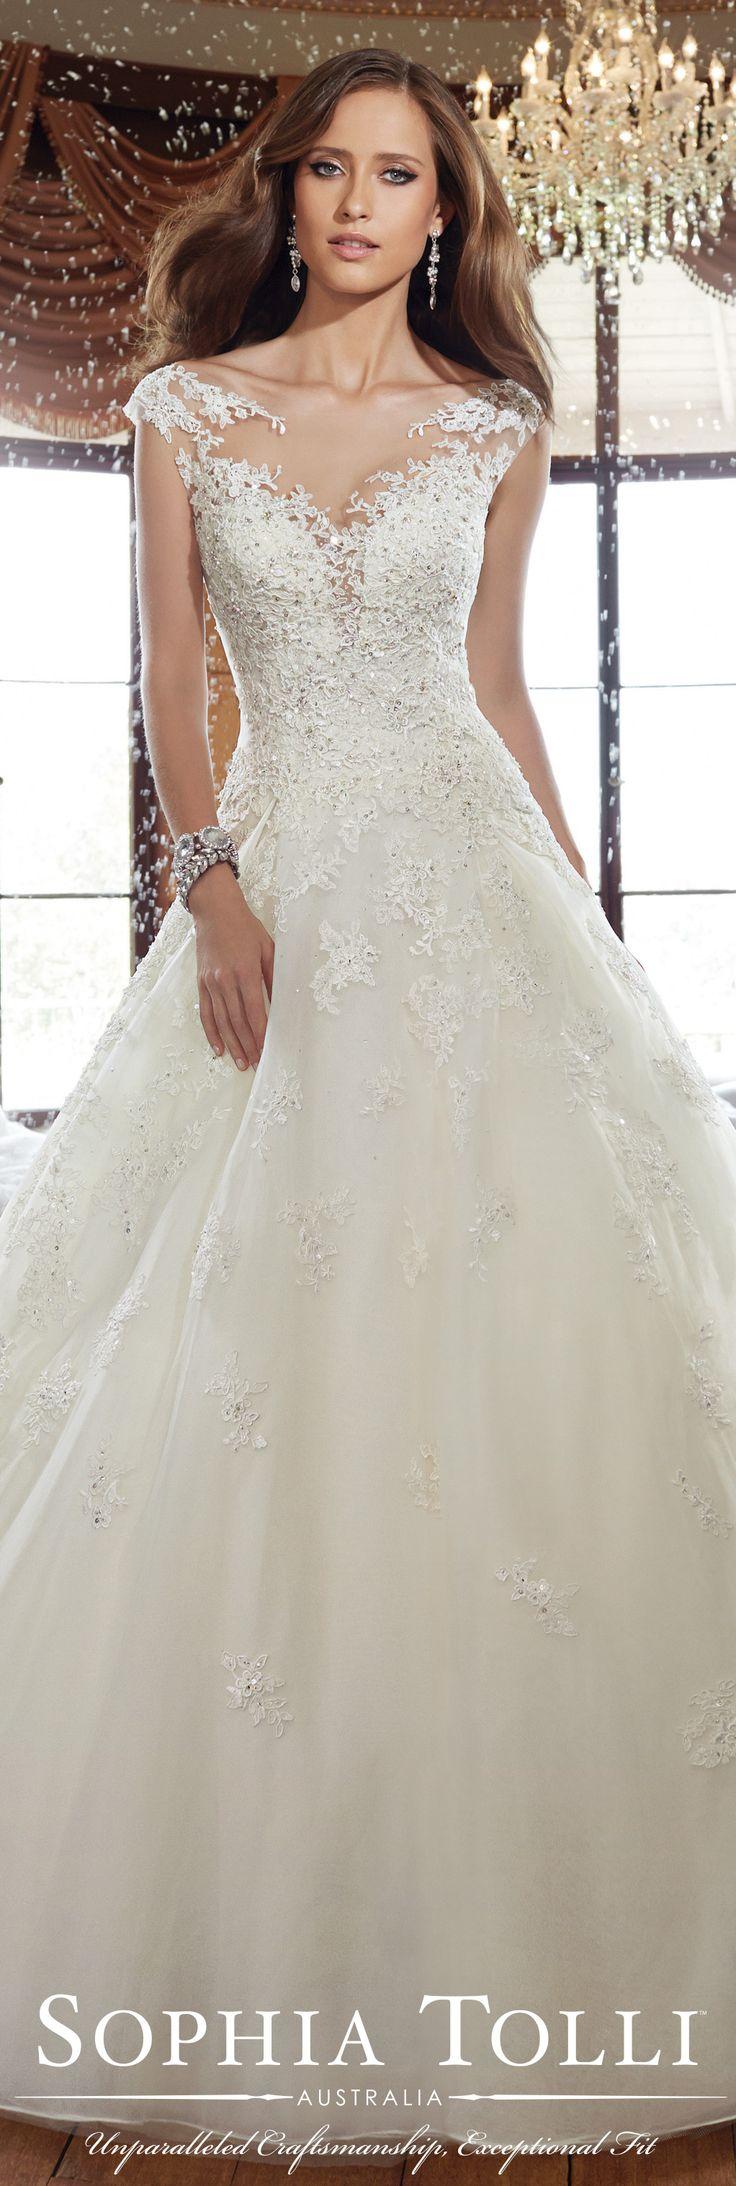 The Sophia Tolli Fall 2015 Wedding Dress Collection - Style No. Y21509 sophiatolli.com #laceweddingdress